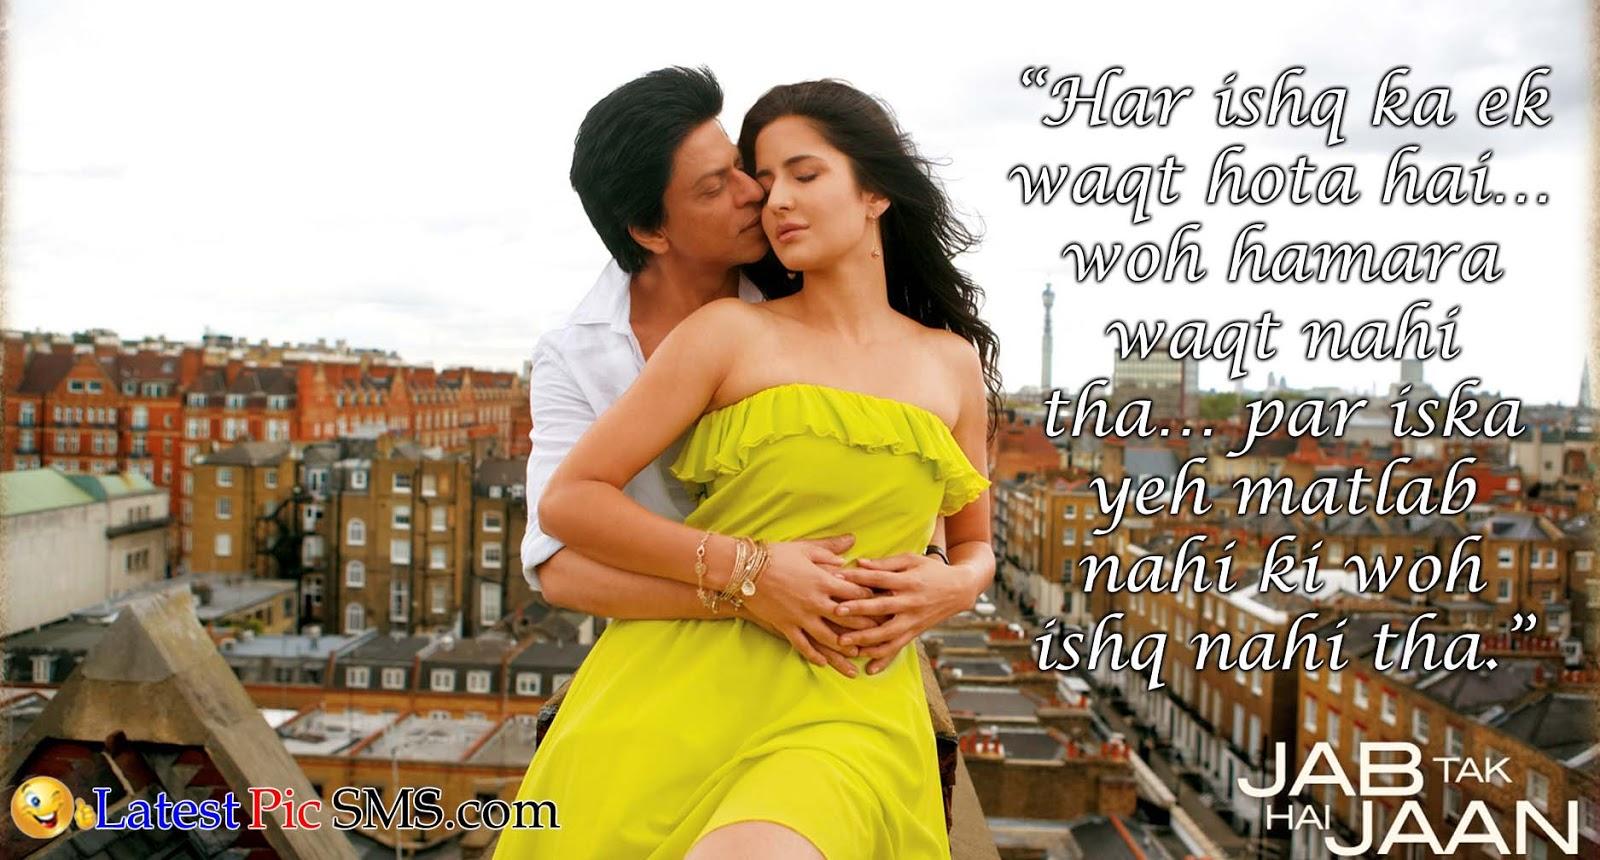 jab tak hai jaan Bollywood Dialogues